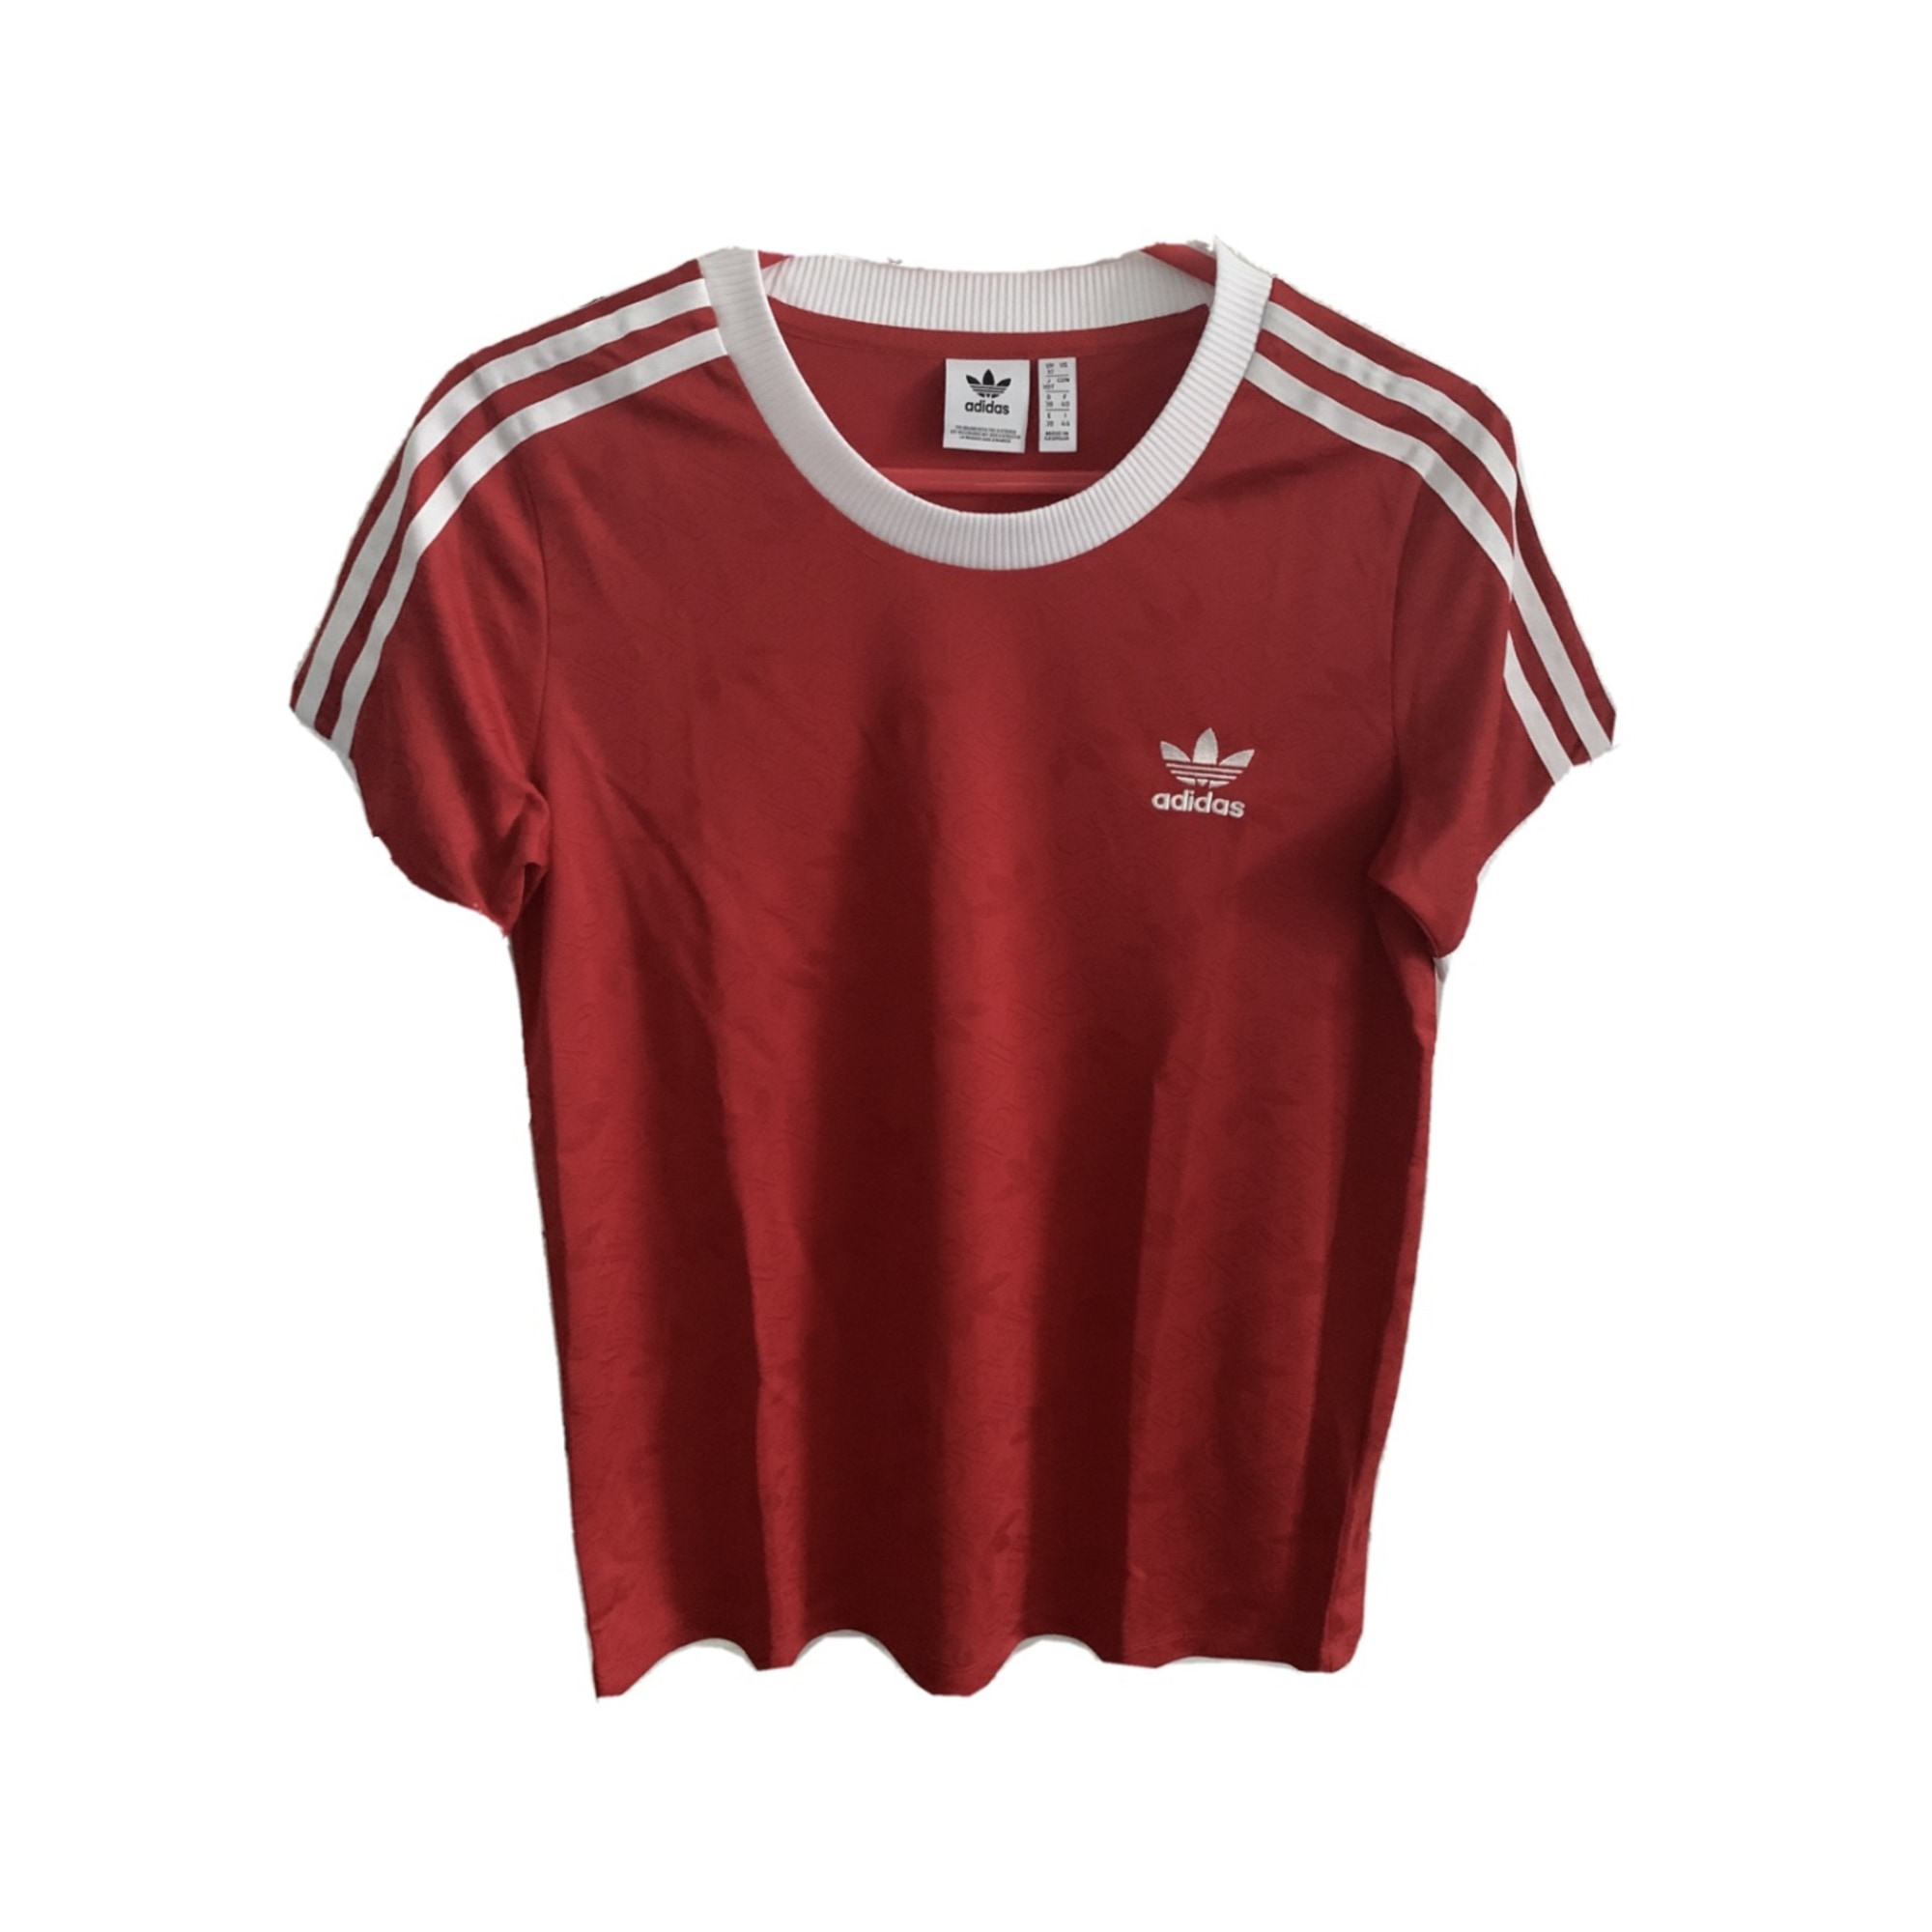 Top, tee-shirt ADIDAS Rouge, bordeaux